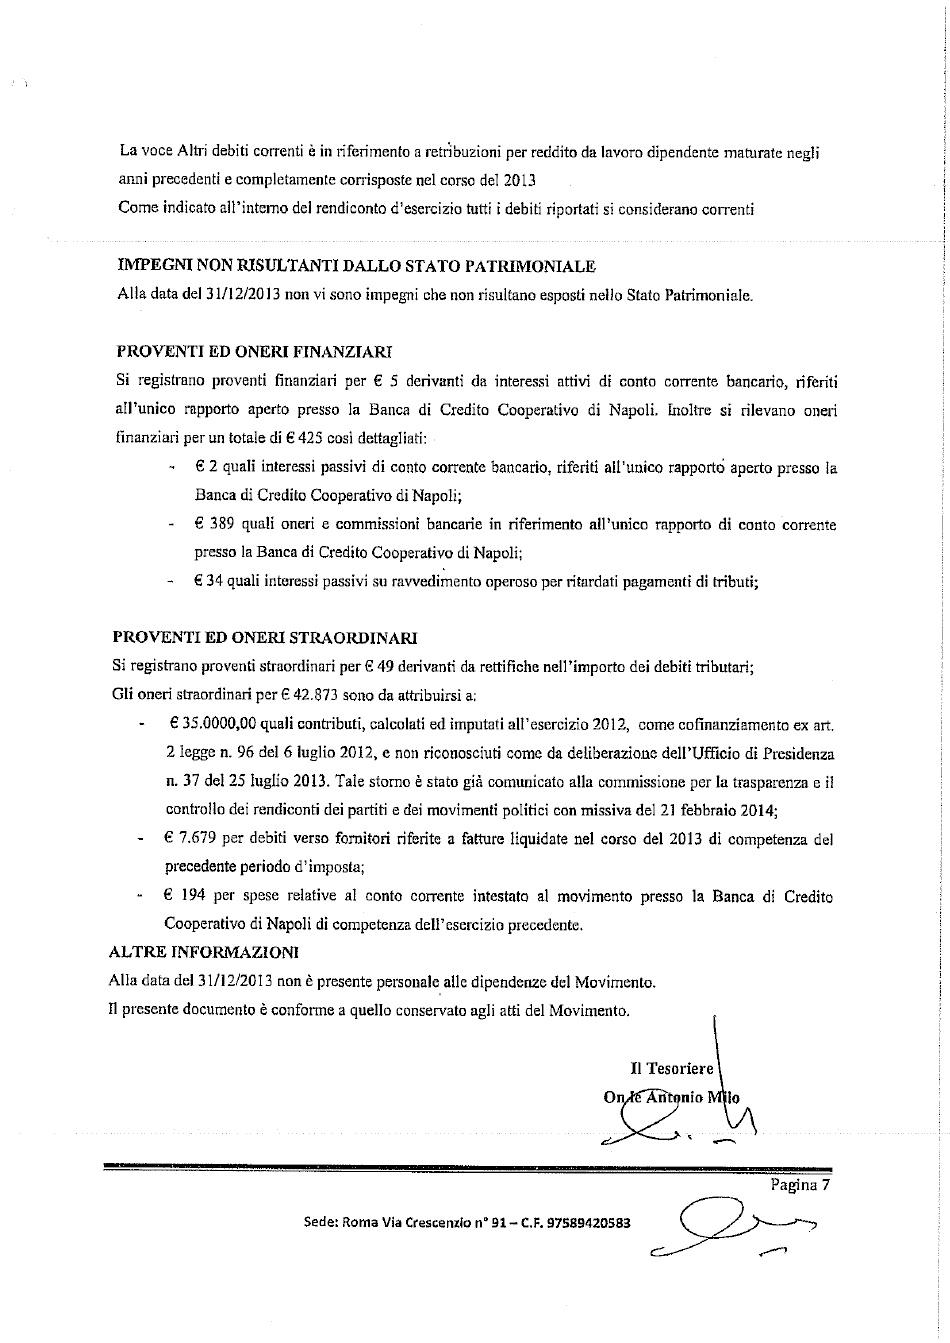 nota integrativa bilancio 2013-7